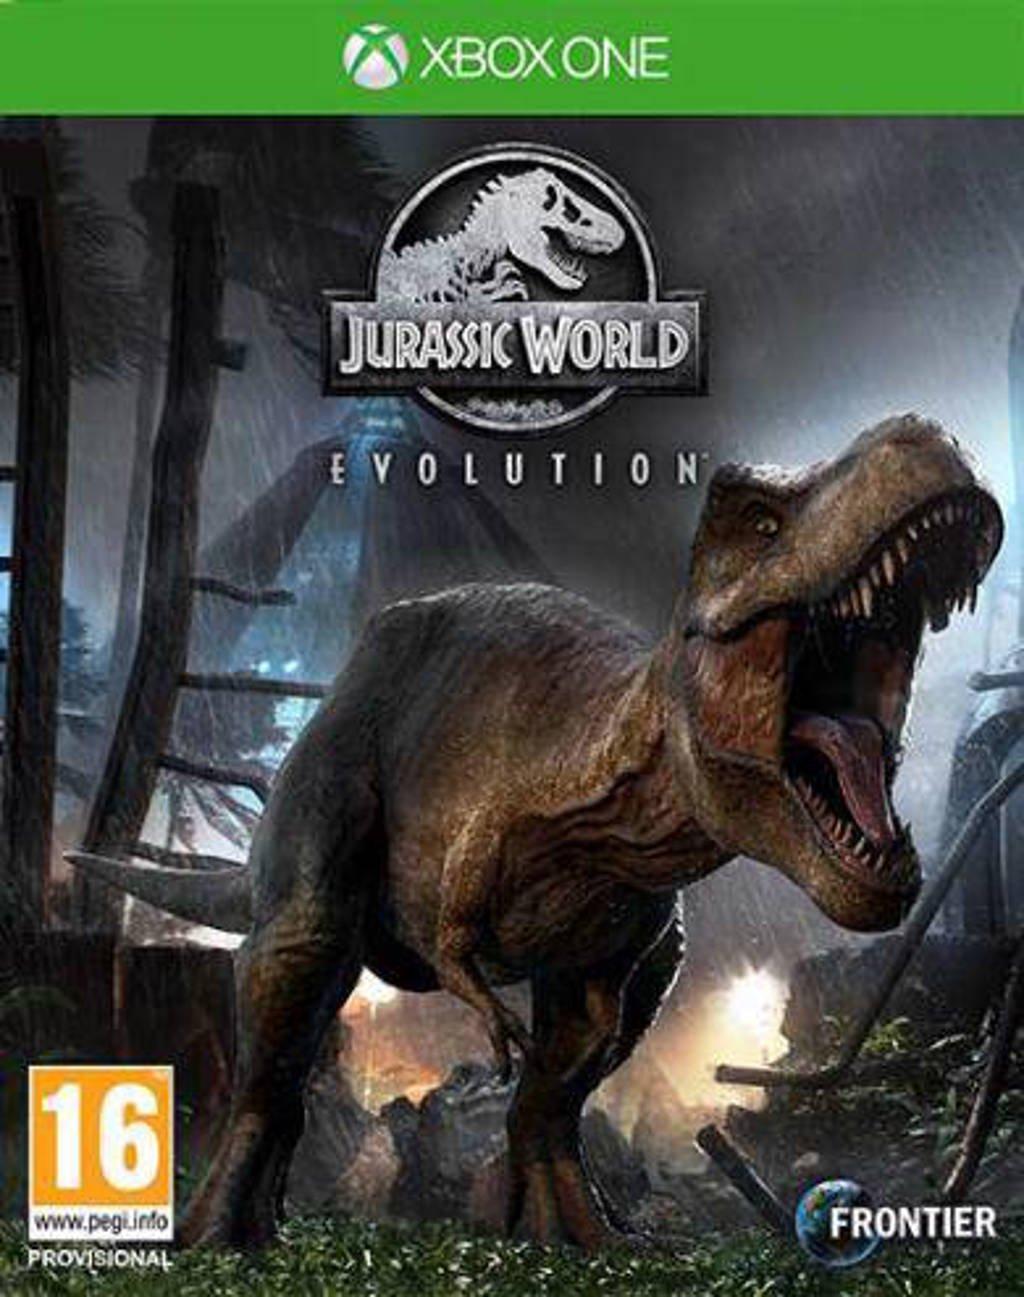 Jurassic world - Evolution (Xbox One)